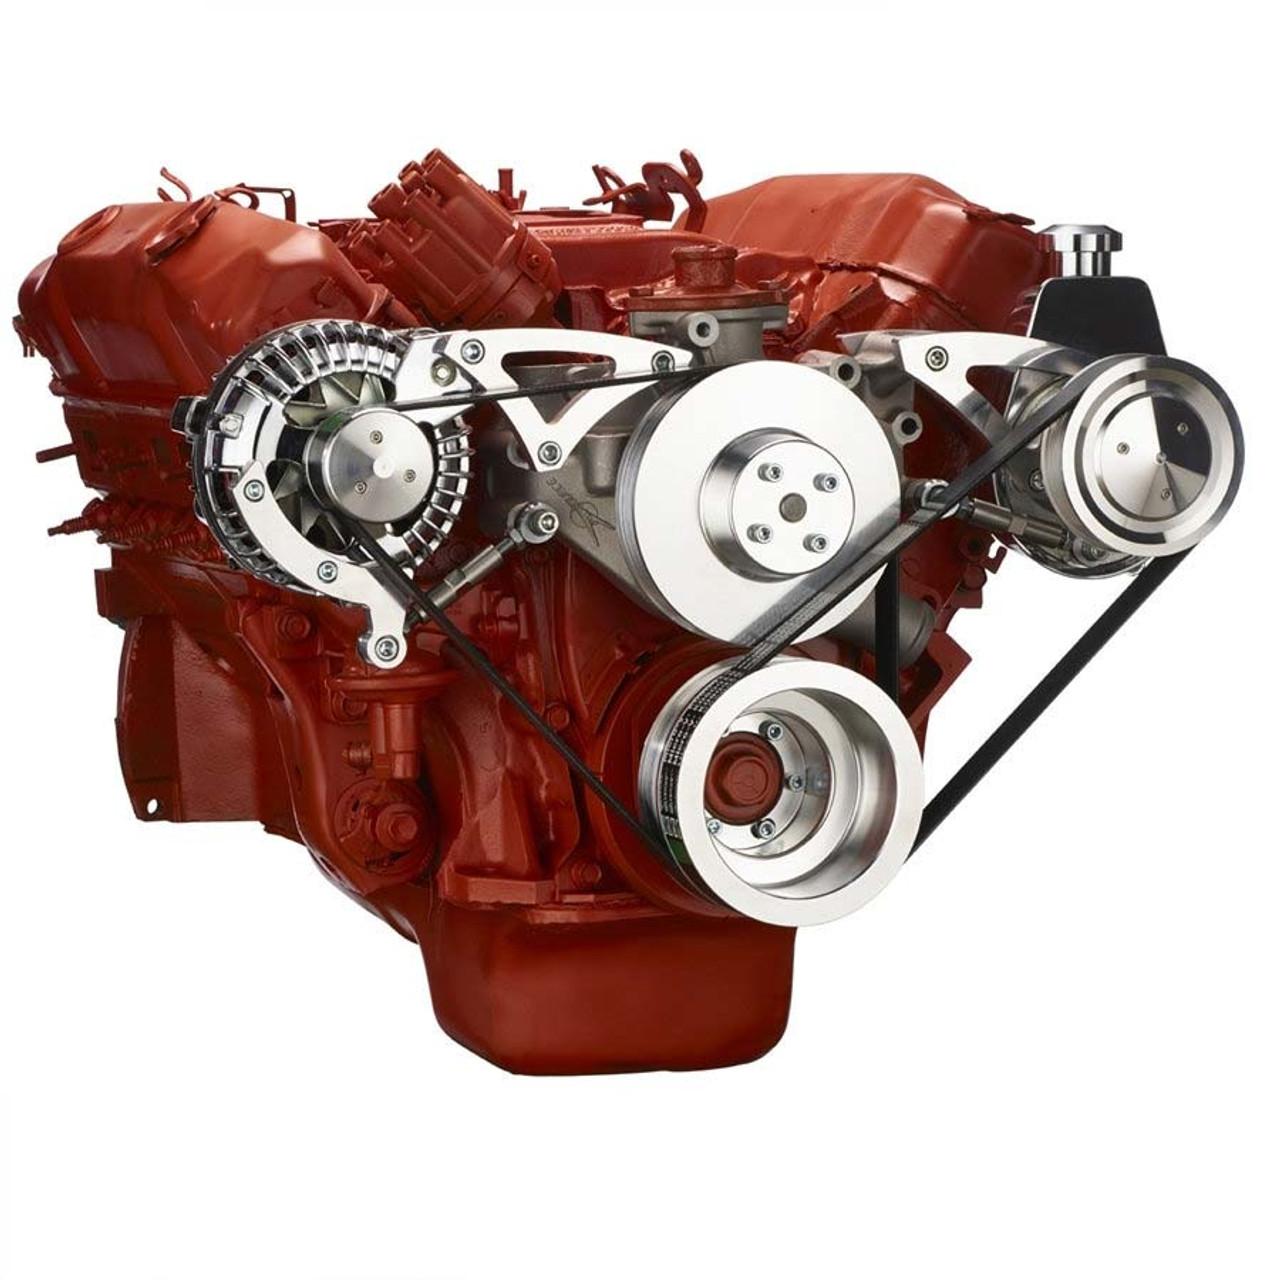 Chrysler Big Block Alternator Power Steering Serpentine Conversion March Pontiac